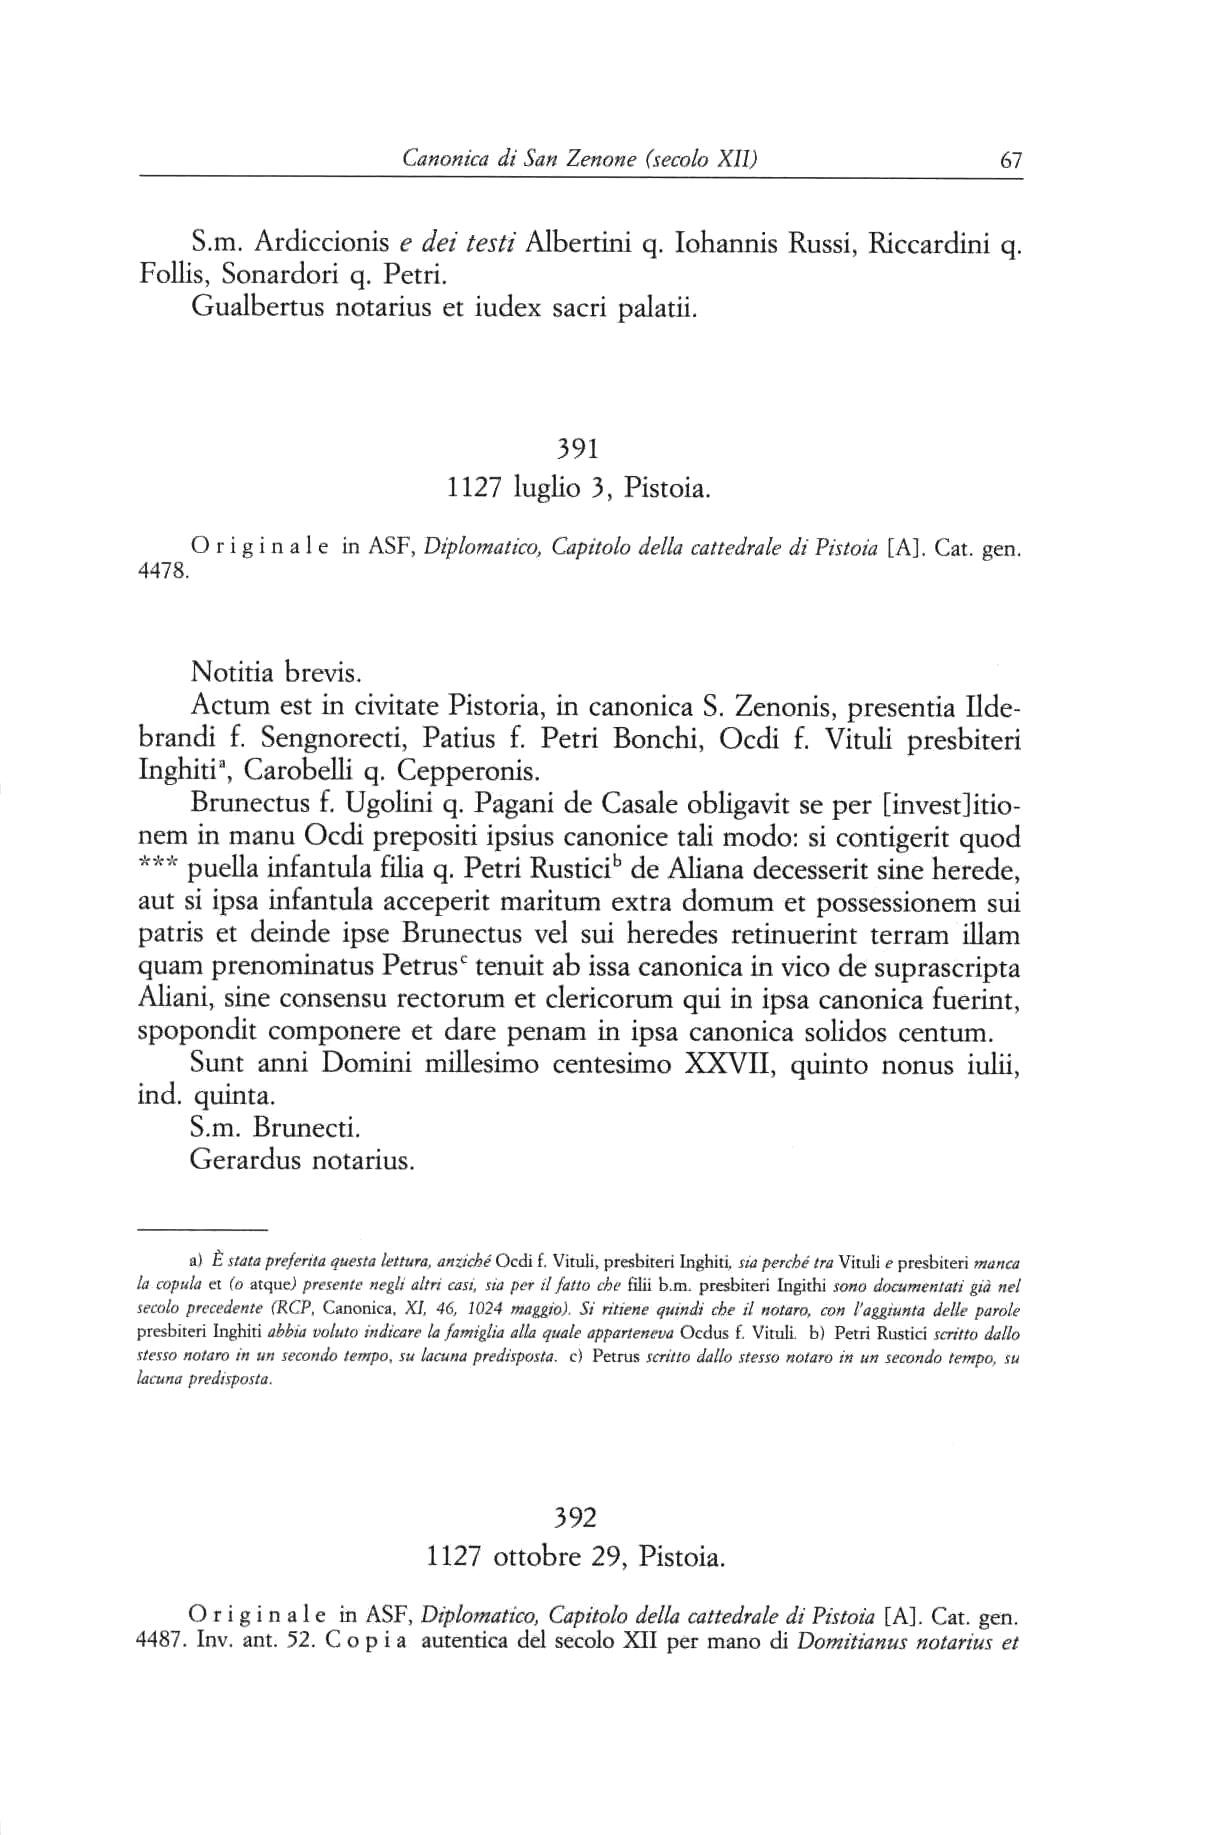 Canonica S. Zenone XII 0067.jpg